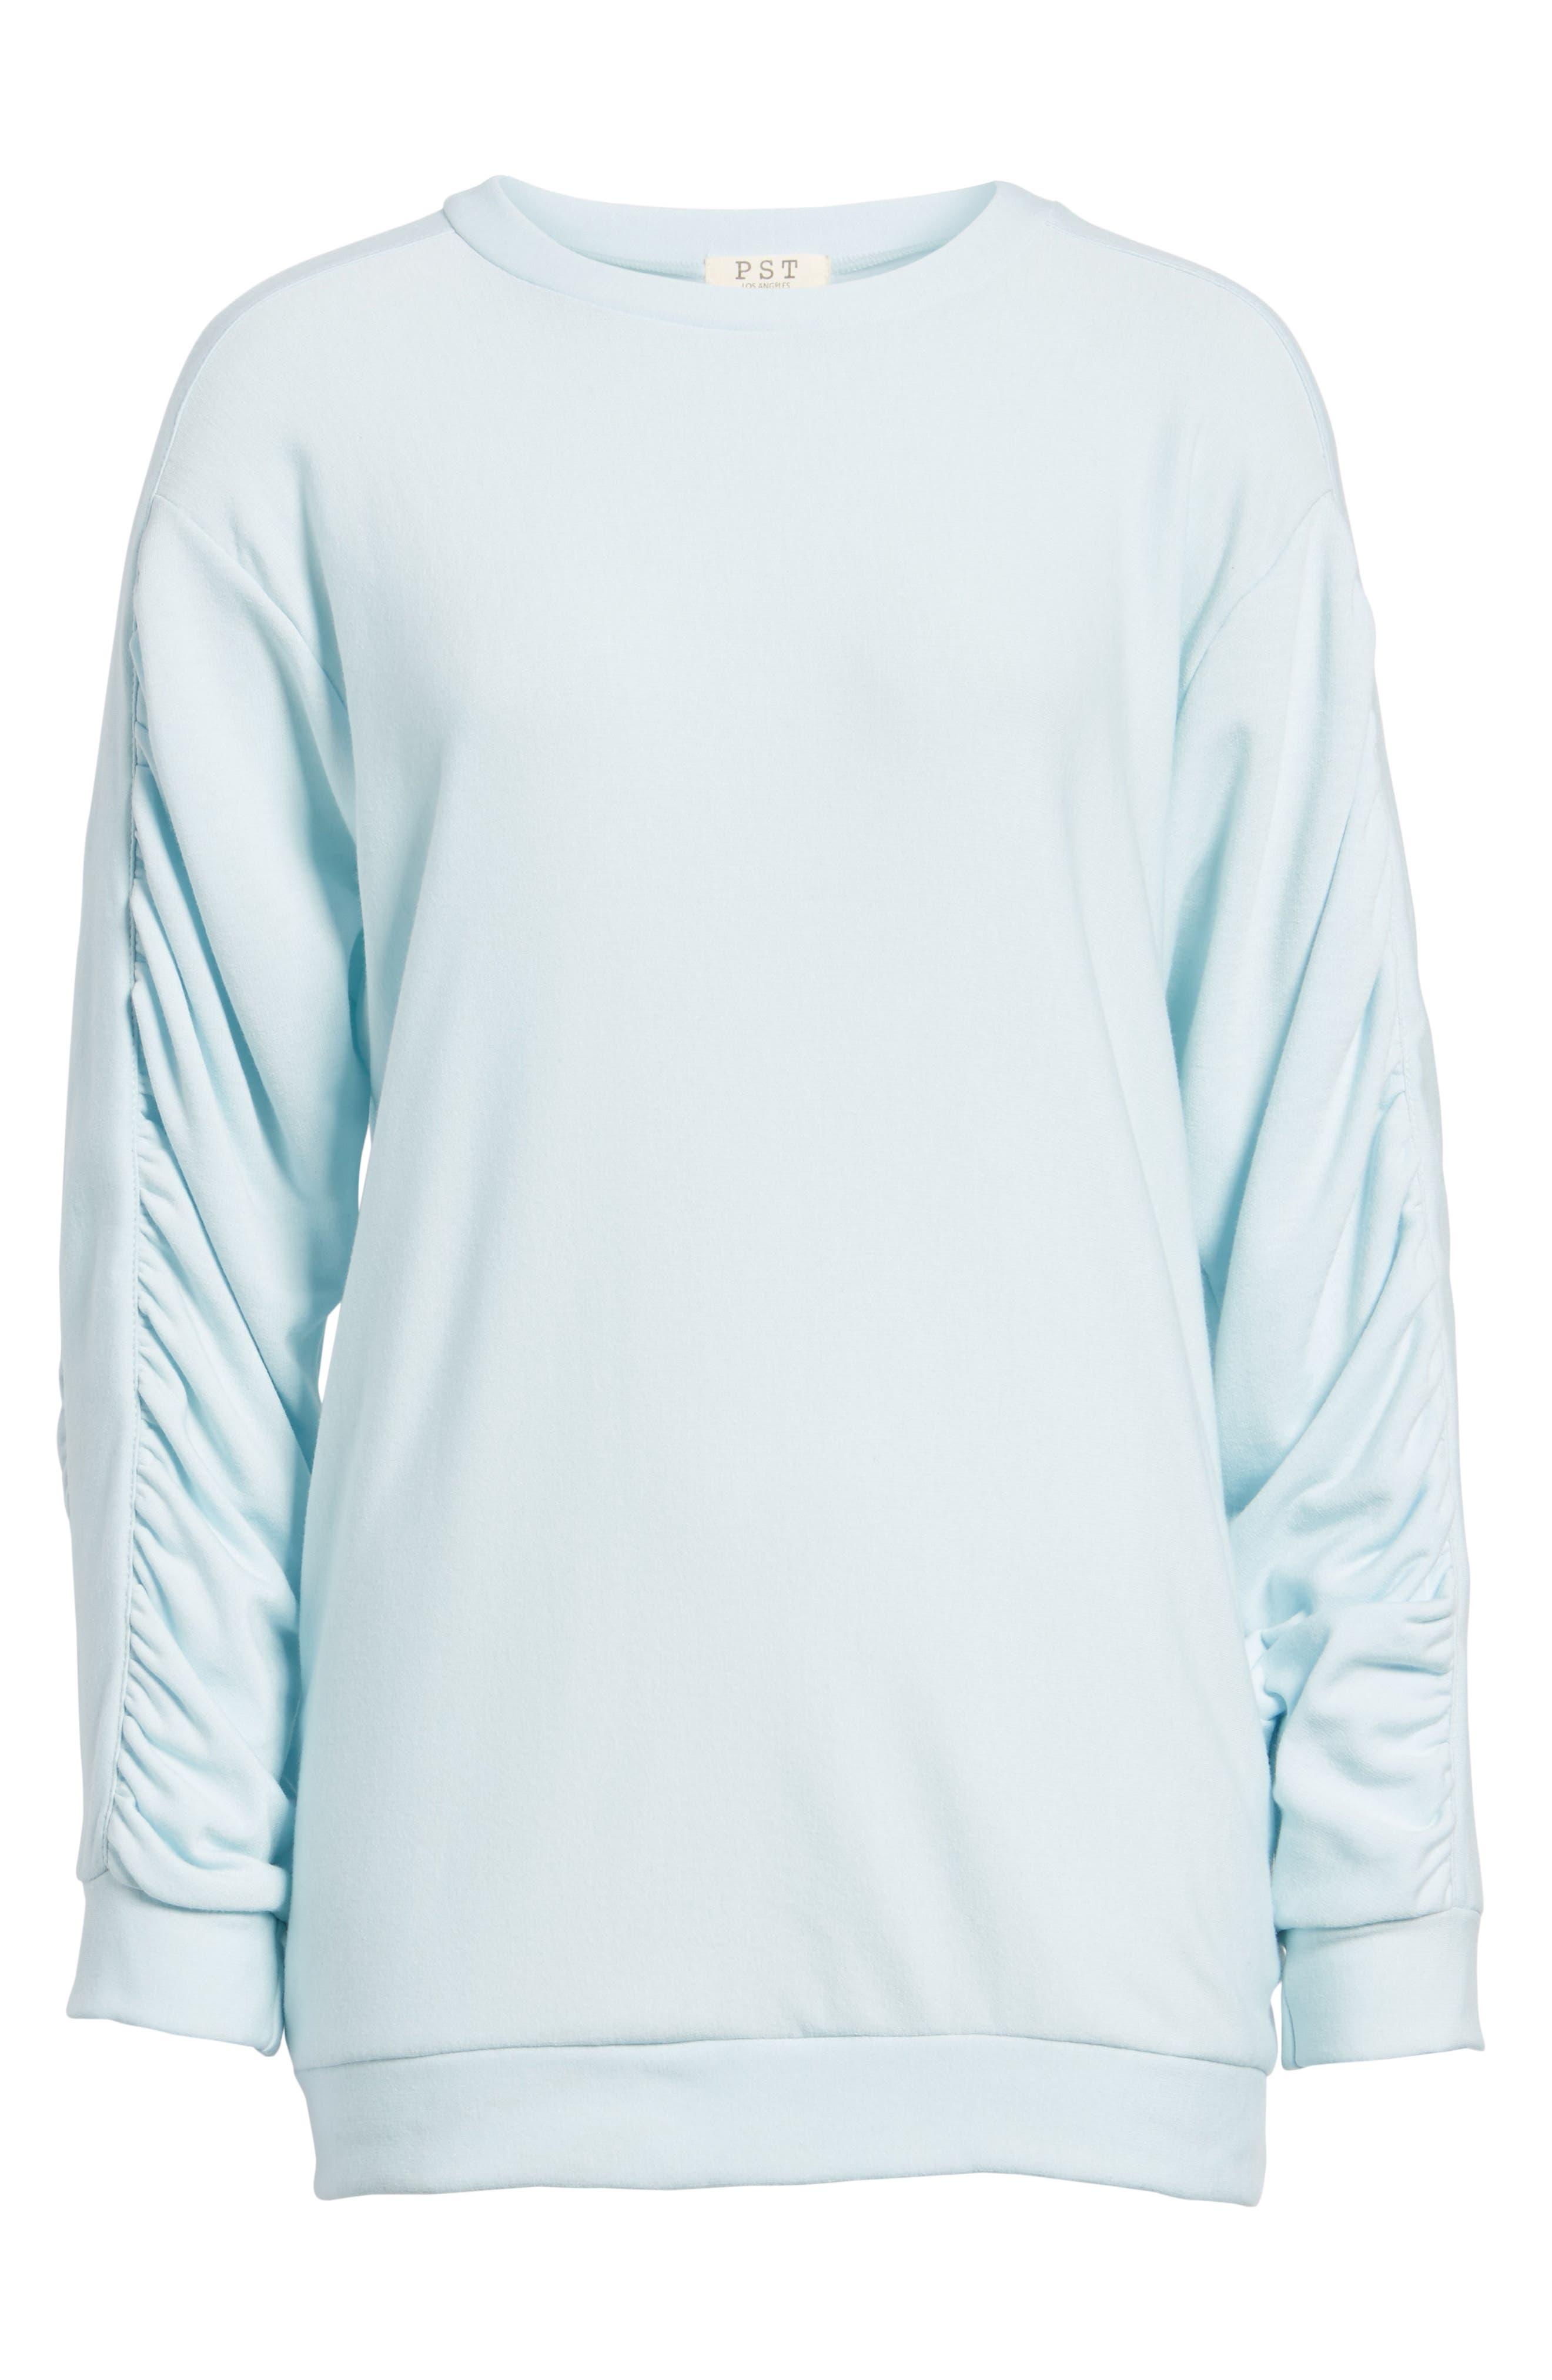 Ruched Sleeve Sweatshirt,                             Alternate thumbnail 12, color,